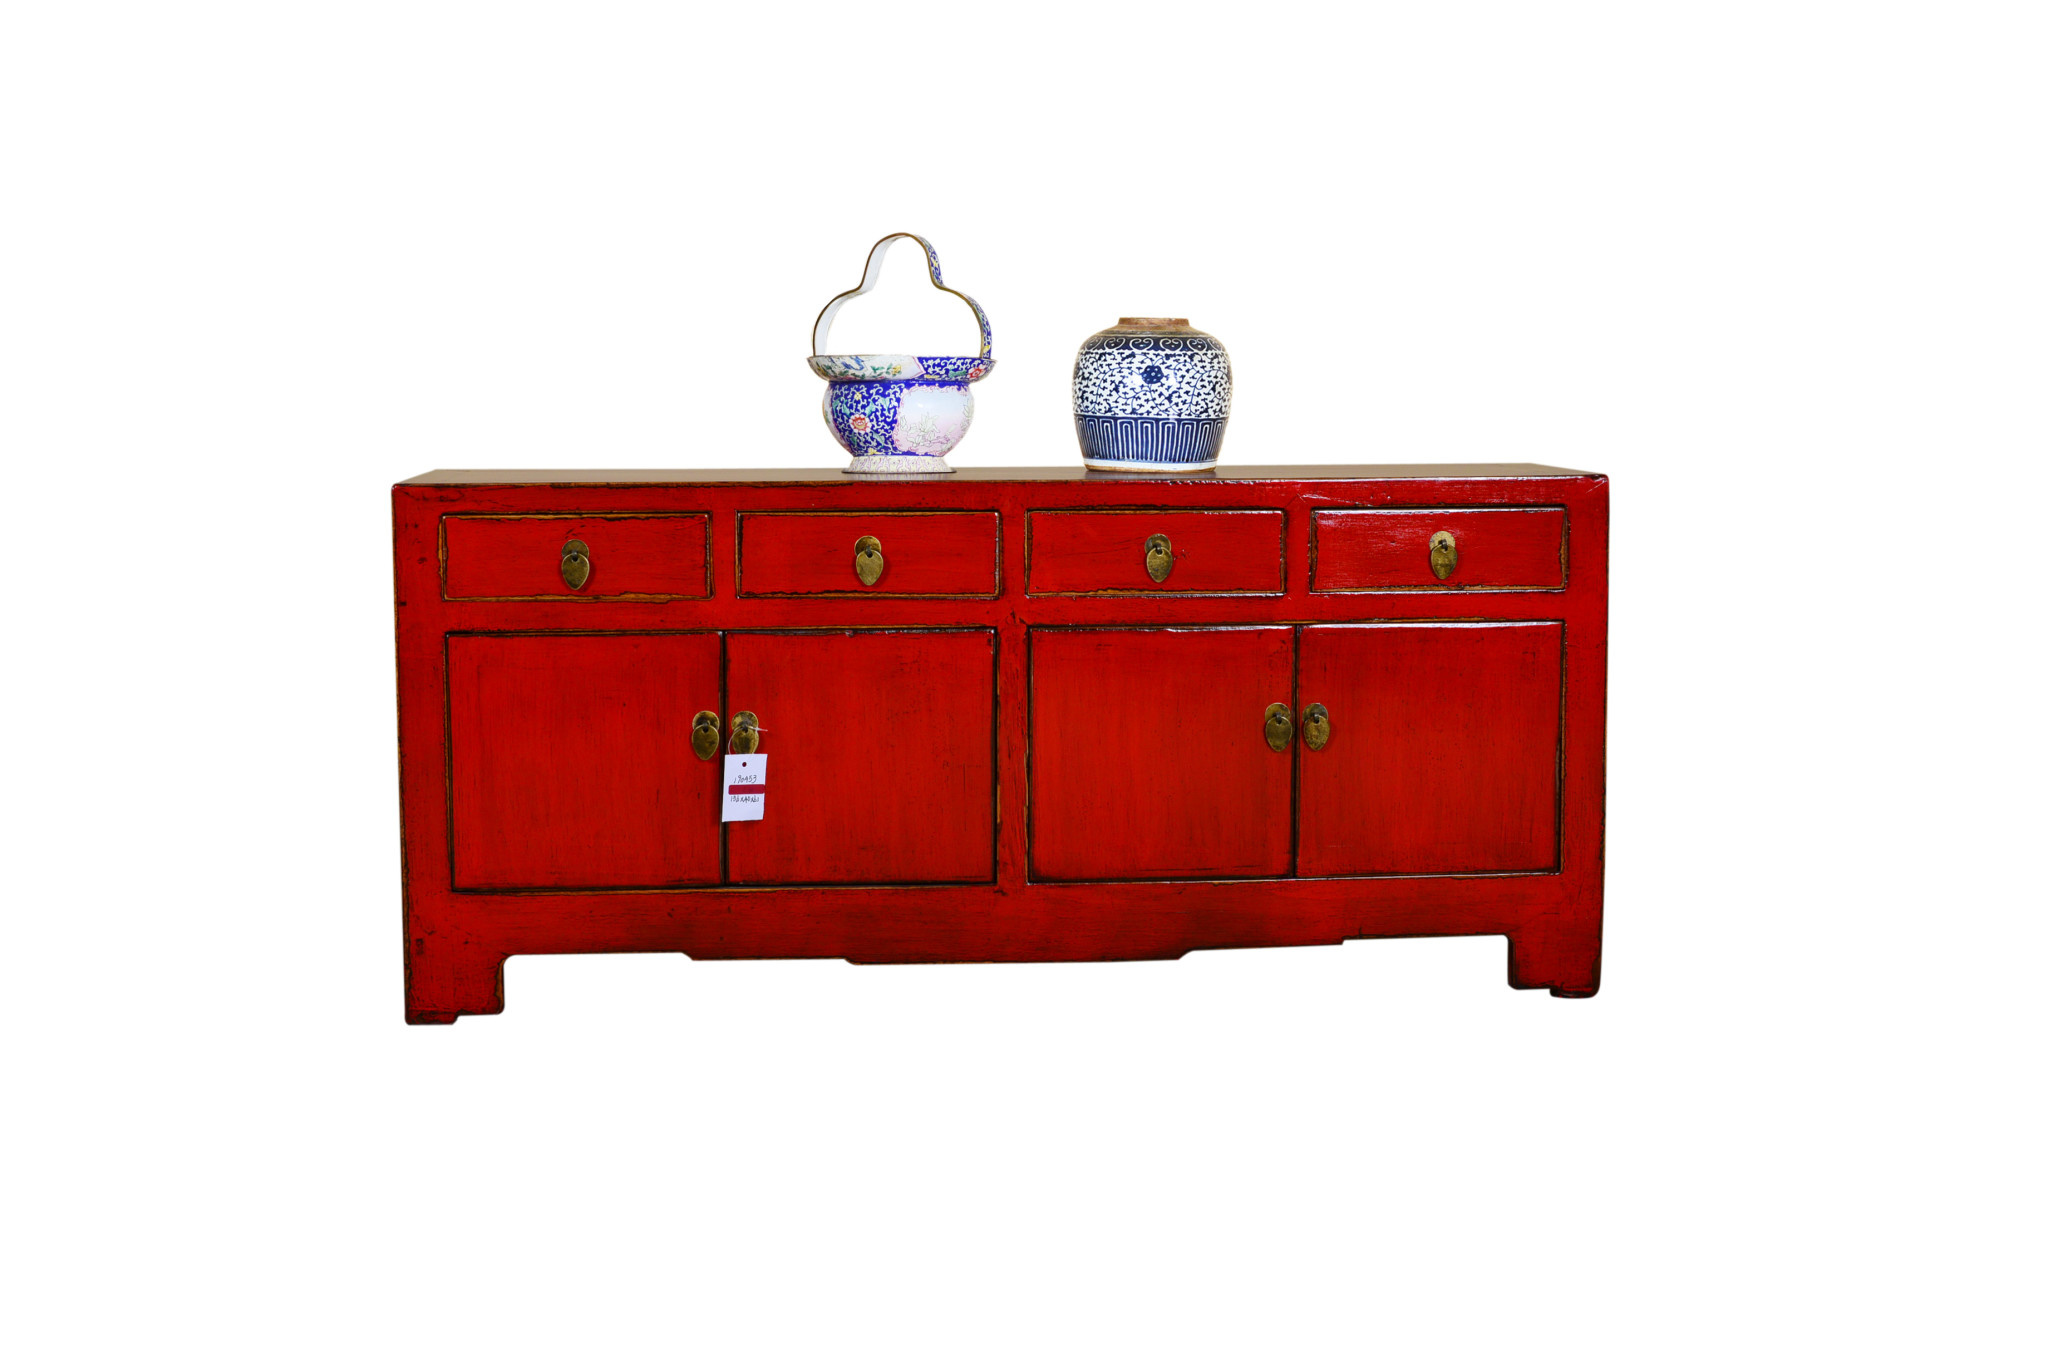 Chinese Antieke Tv Kast.Chinese Tv Kast Kopen Orientique Nl Shop 200 Modellen